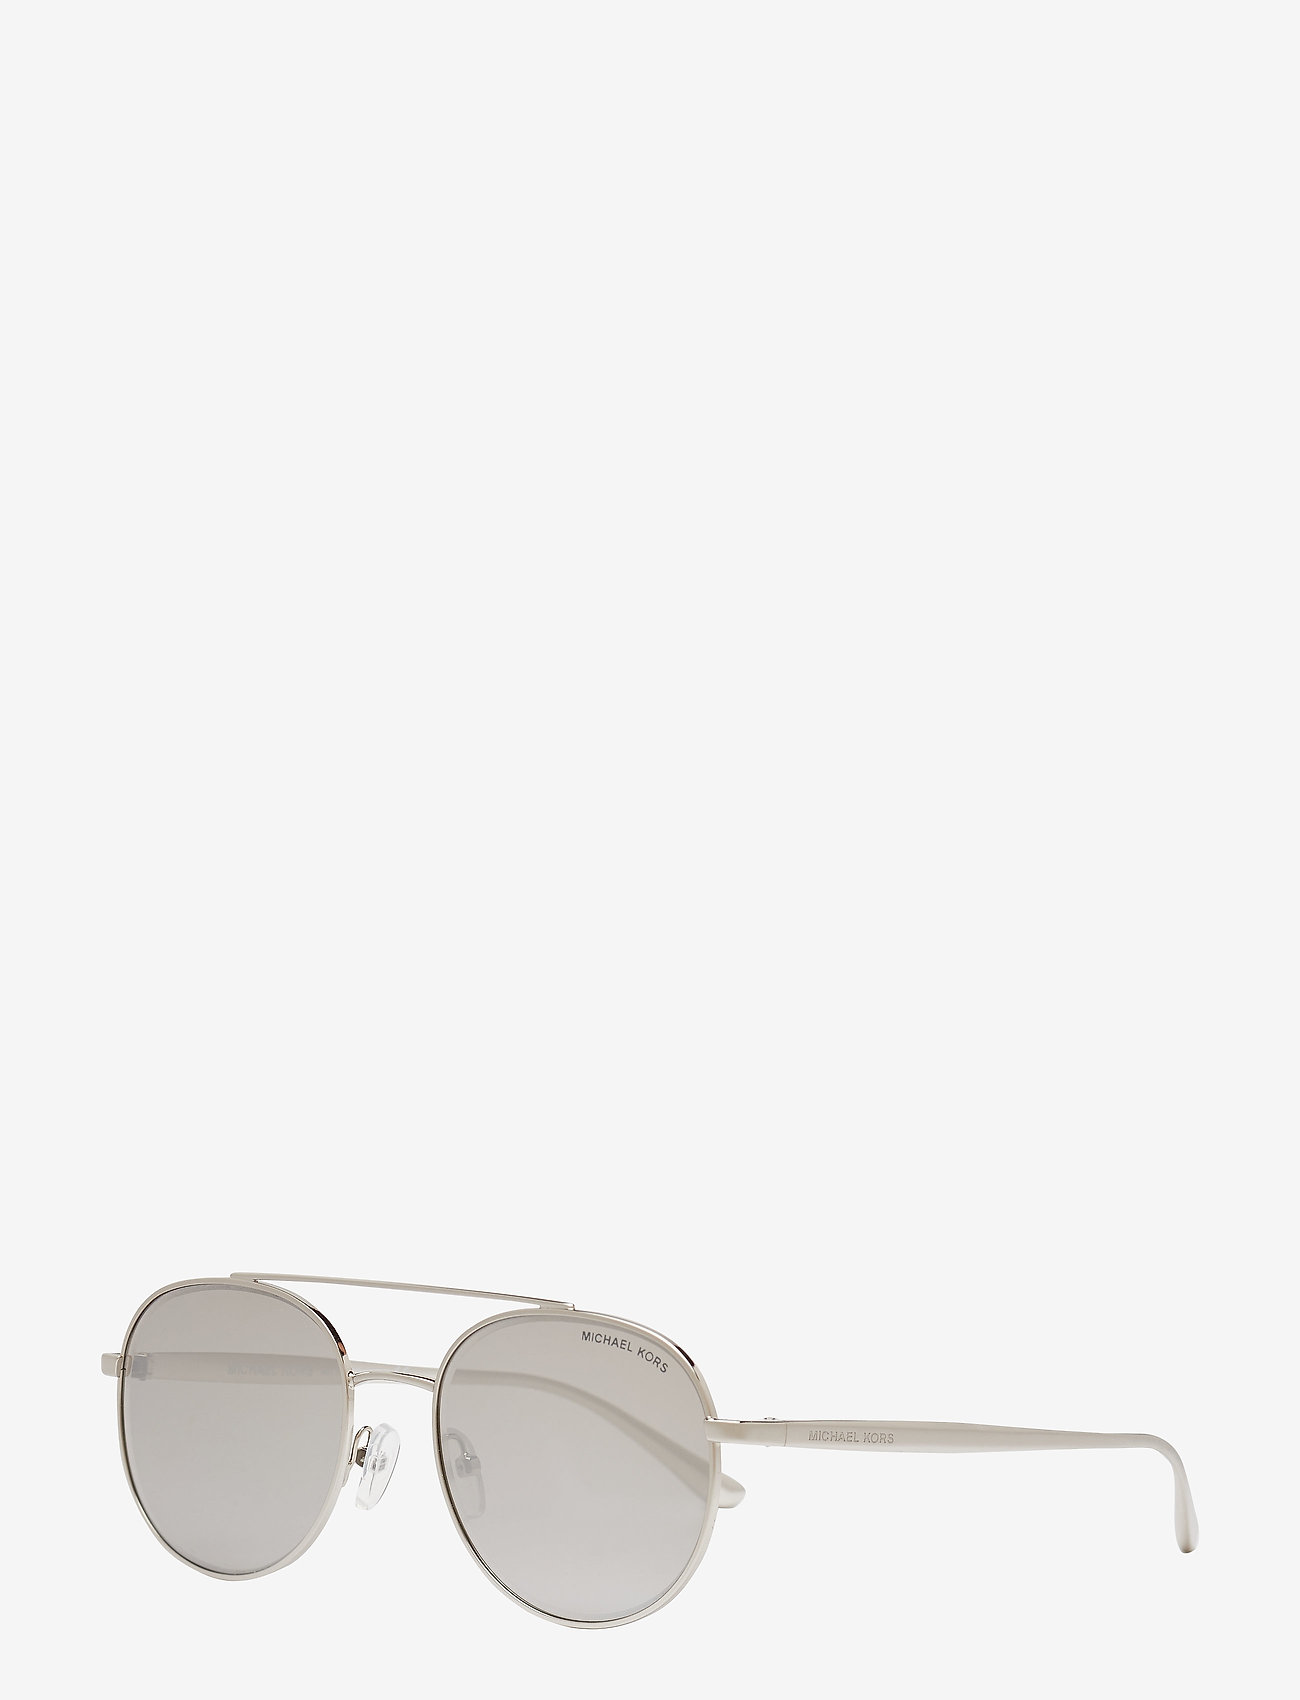 Michael Kors Sunglasses - Aviator - okulary przeciwsłoneczne aviator - silver - 1